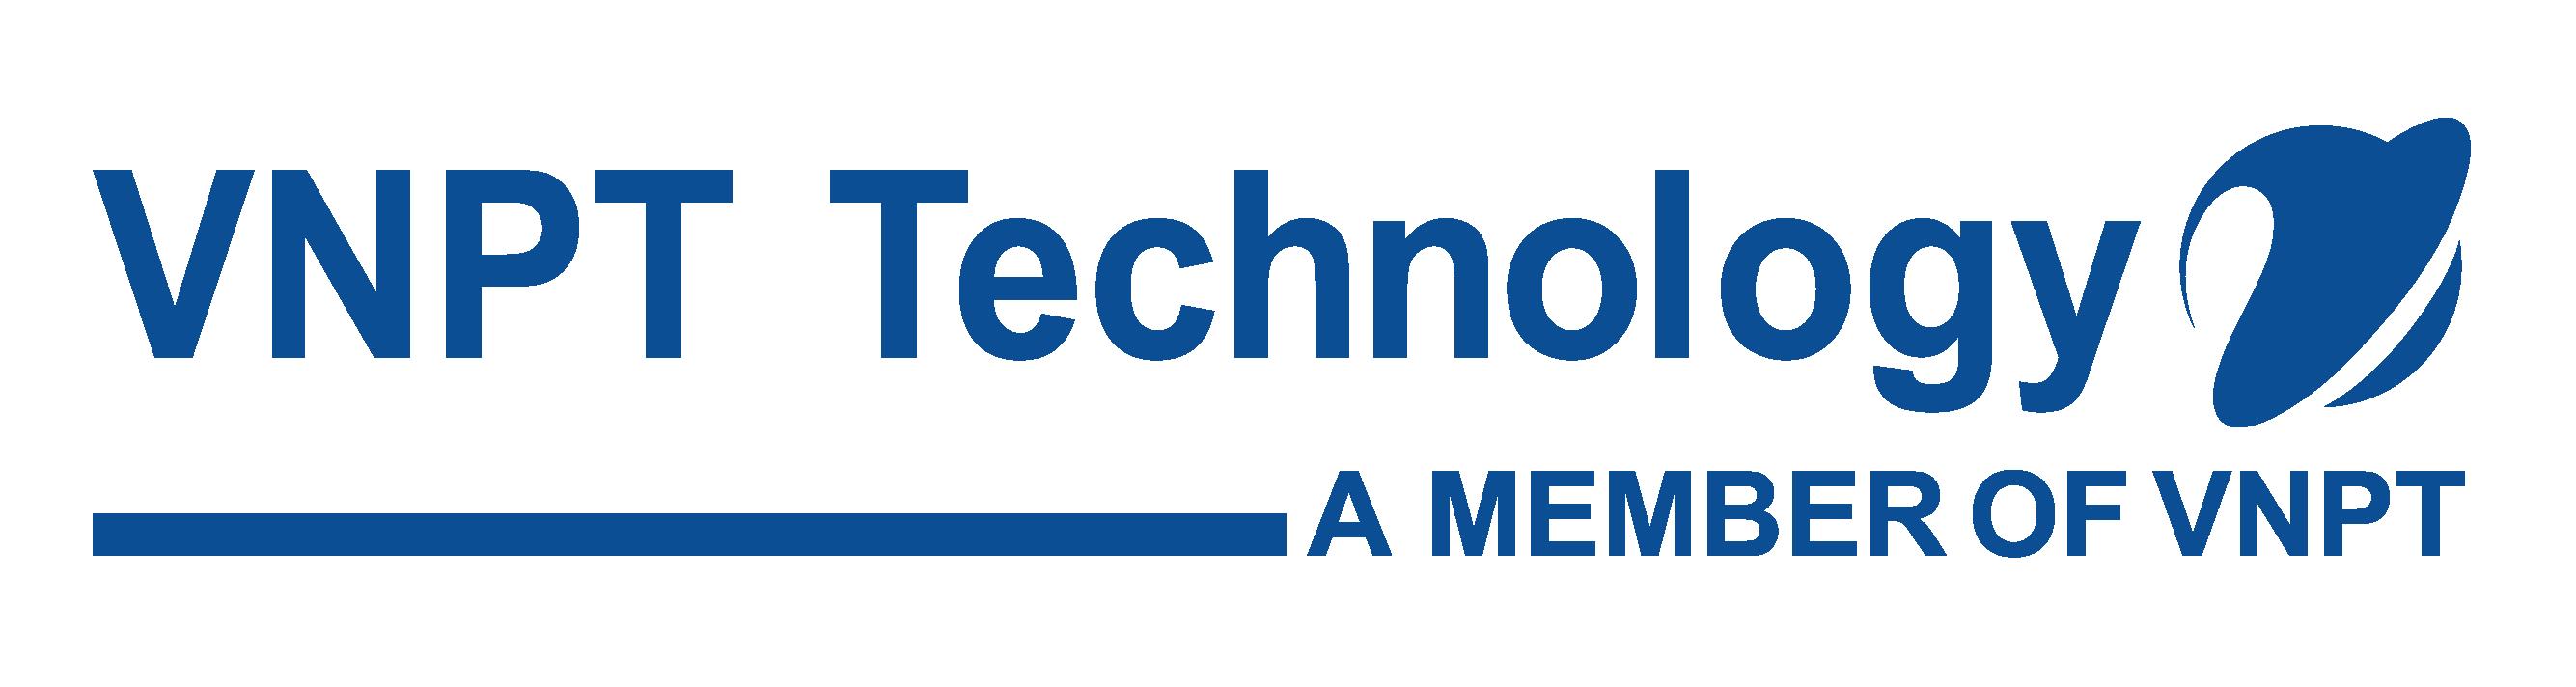 Công Ty VNPT Technology